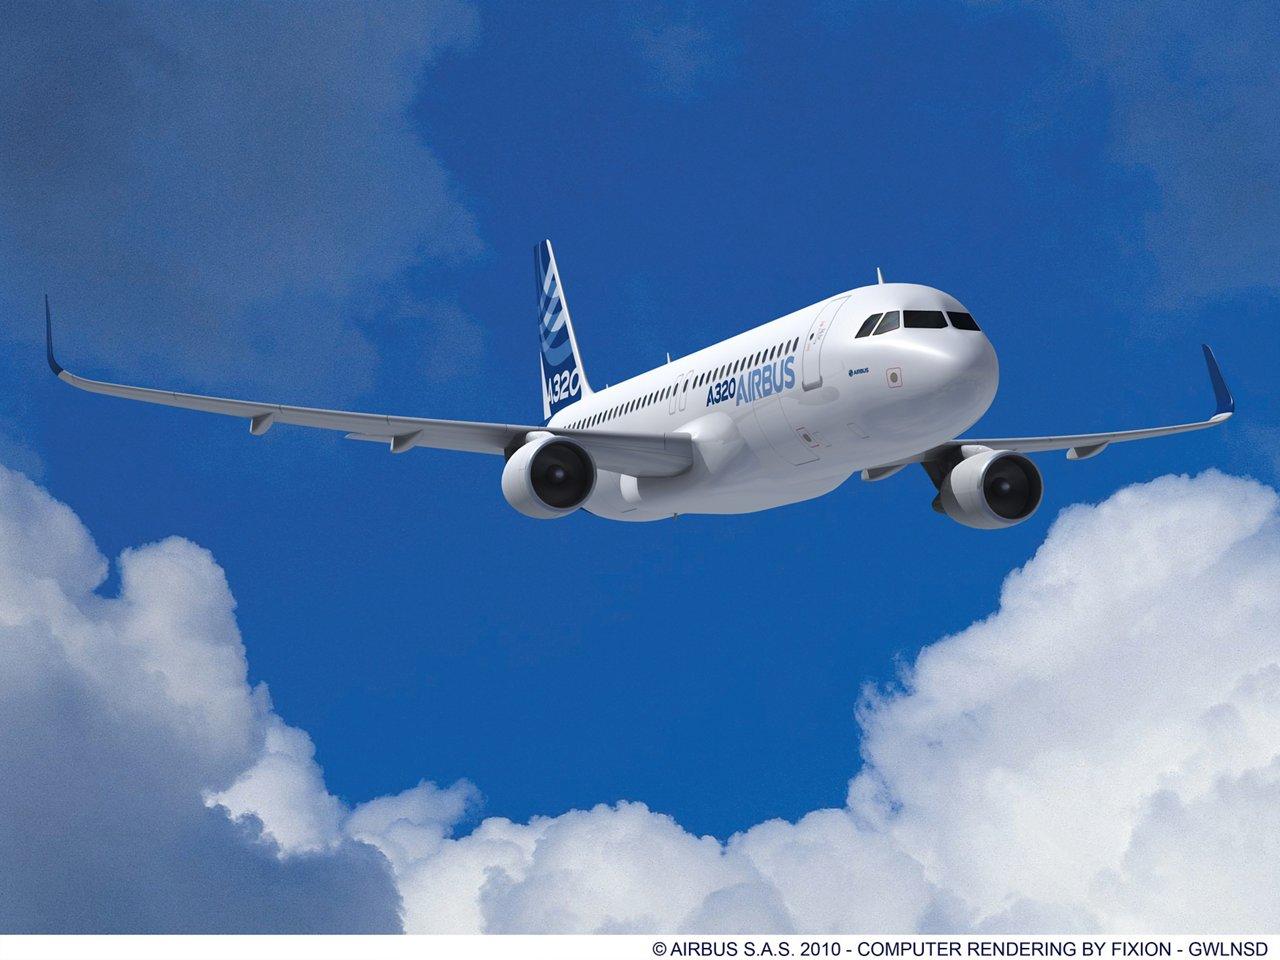 AIRBUS A320 SHARKLET CFM AIRBUS V02 300dpi